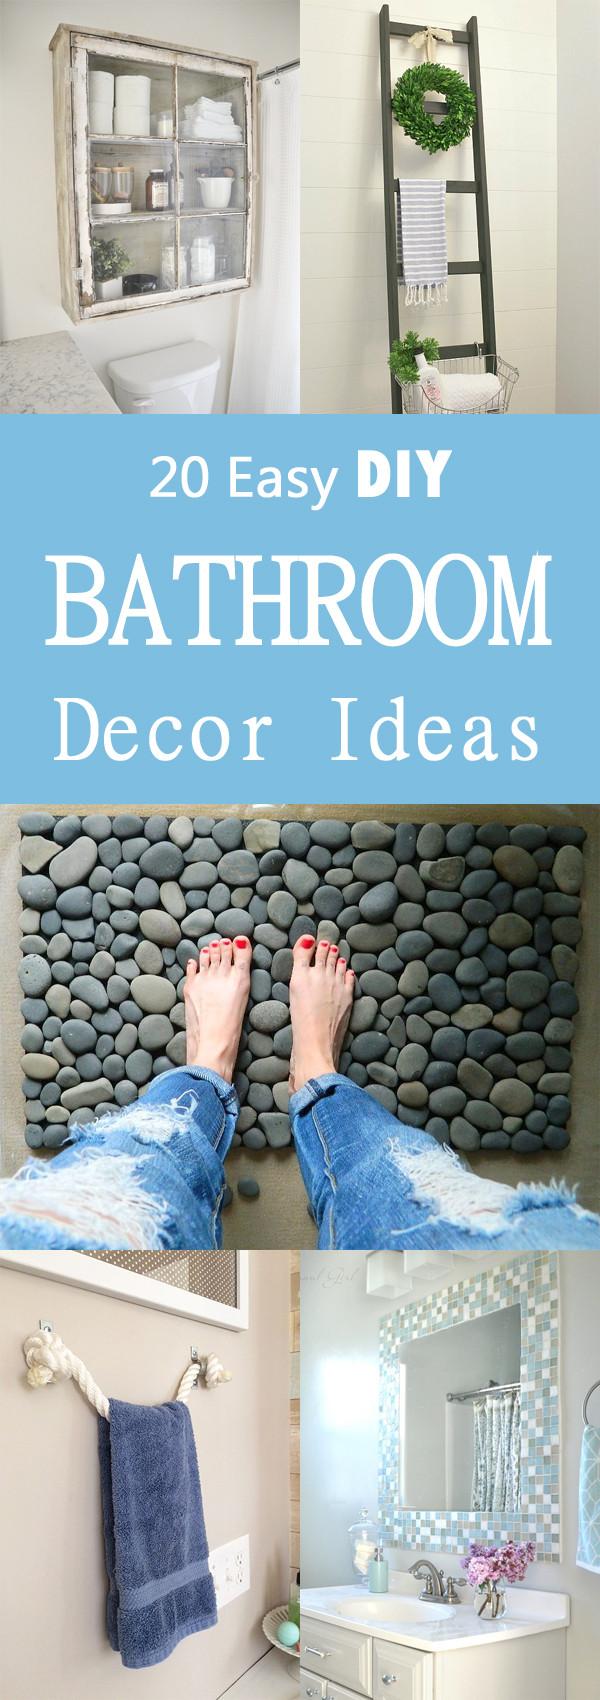 Best ideas about Bathroom Decorating Ideas DIY . Save or Pin 20 Easy DIY Bathroom Decor Ideas Now.